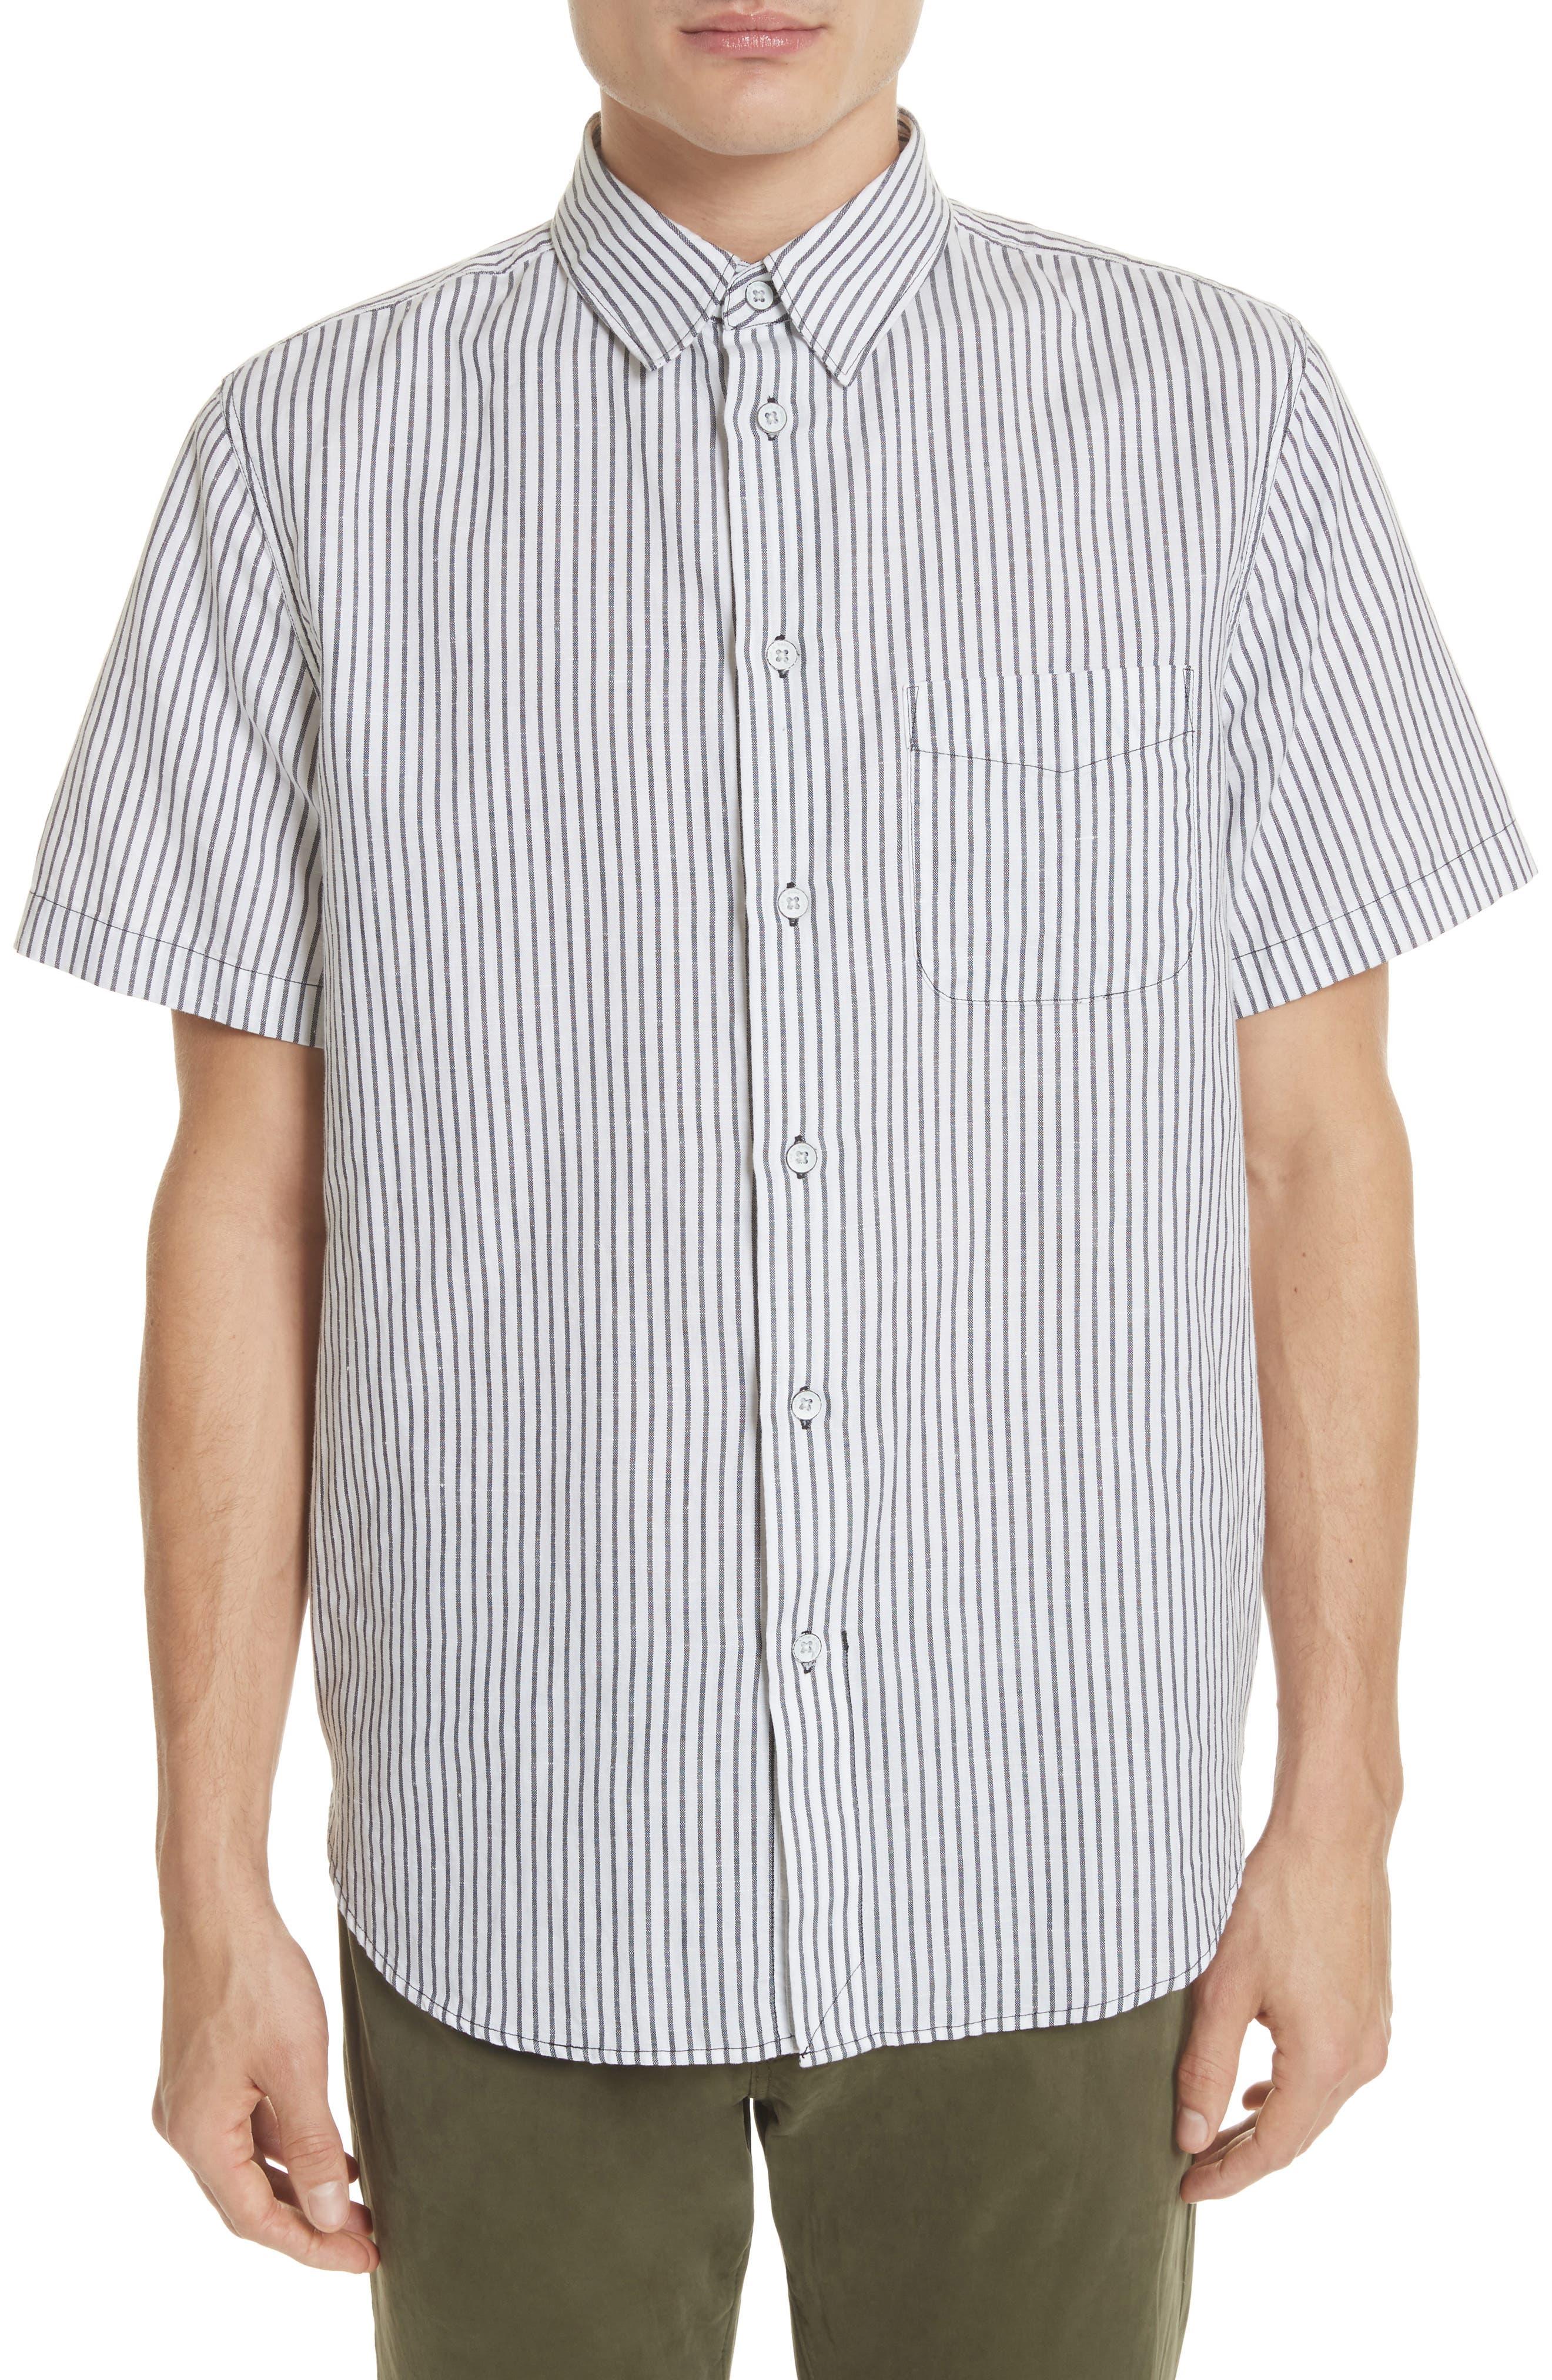 Stripe Short Sleeve Sport Shirt,                         Main,                         color, White/Navy